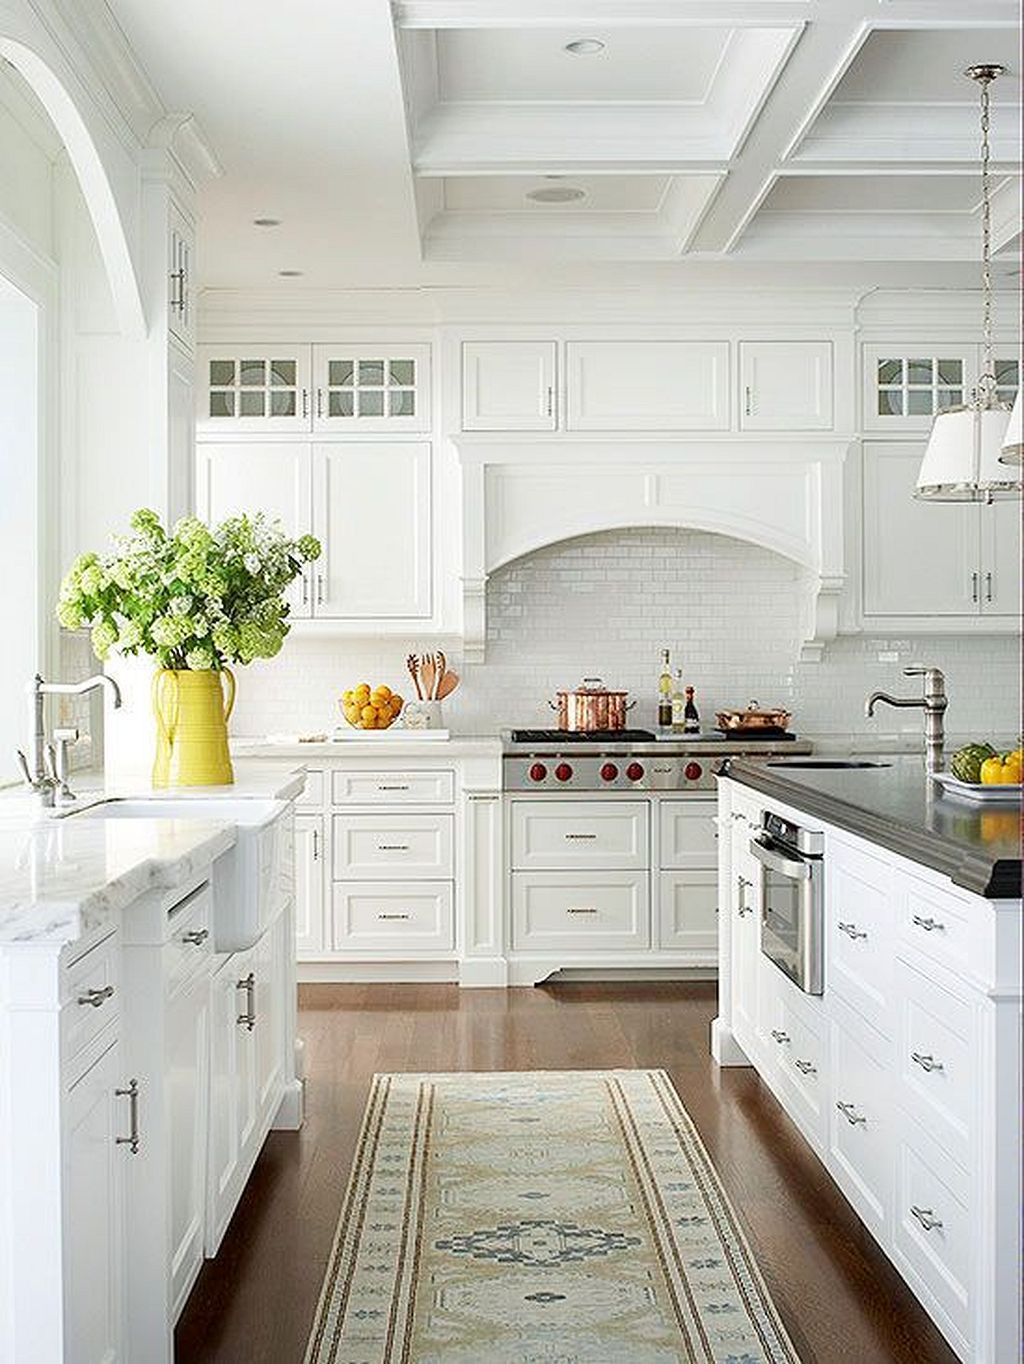 Amazing White Kitchen Ideas 72 | Kitchens, House and Kitchen collection